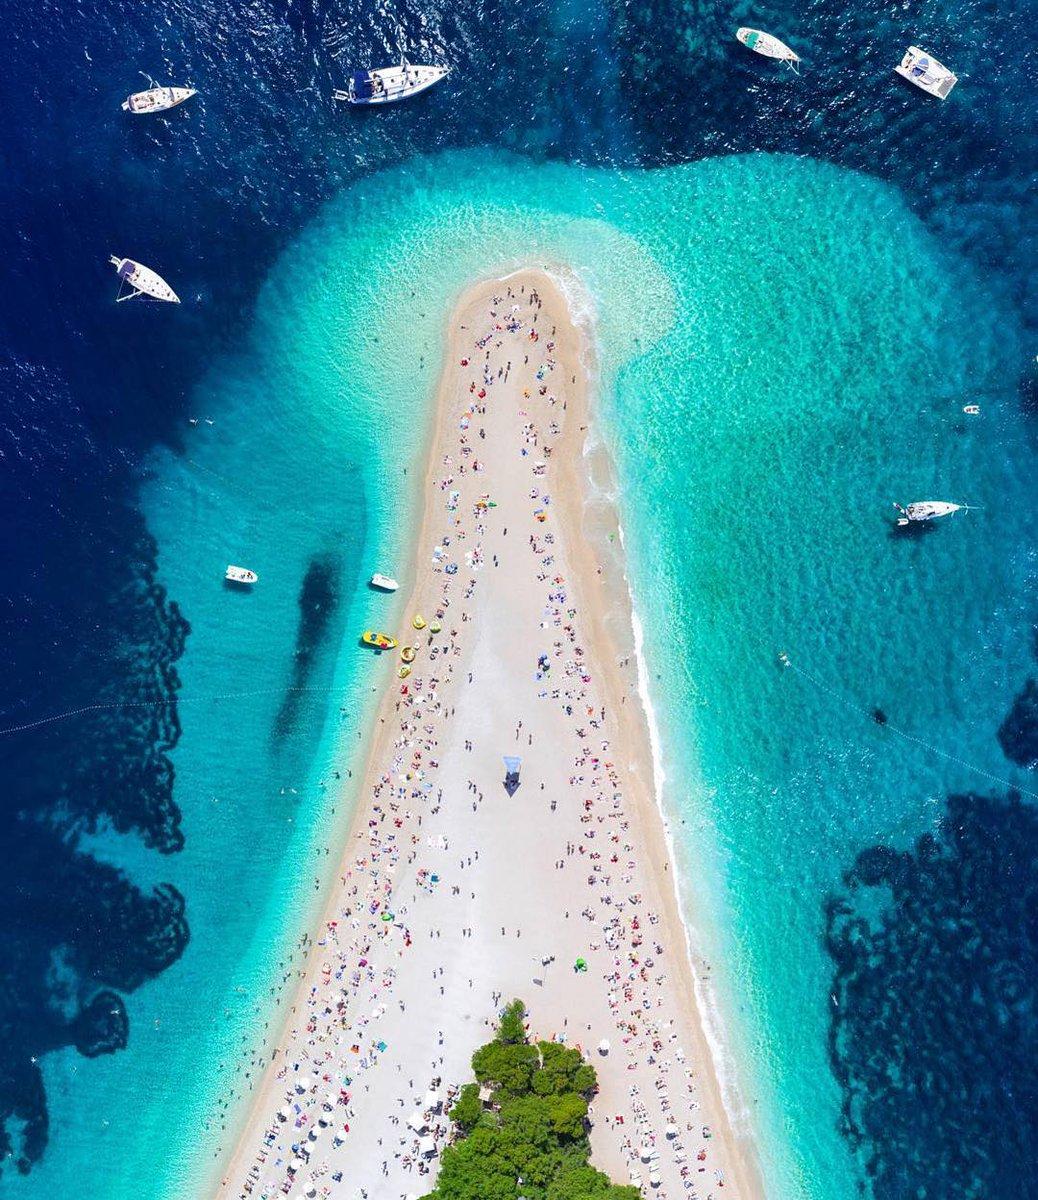 Golden Horn Beach #Croatia#CroatiaFullofLife #travel #showyourtravelpics #livingeurope #beach #sailboat #beachlife #aerial #overview #bluewater #relax #amazing #view #nature #island #islandlife #awesome #RT #wanderlustXL   scicnickpic.twitter.com/XmJwl0qUCj